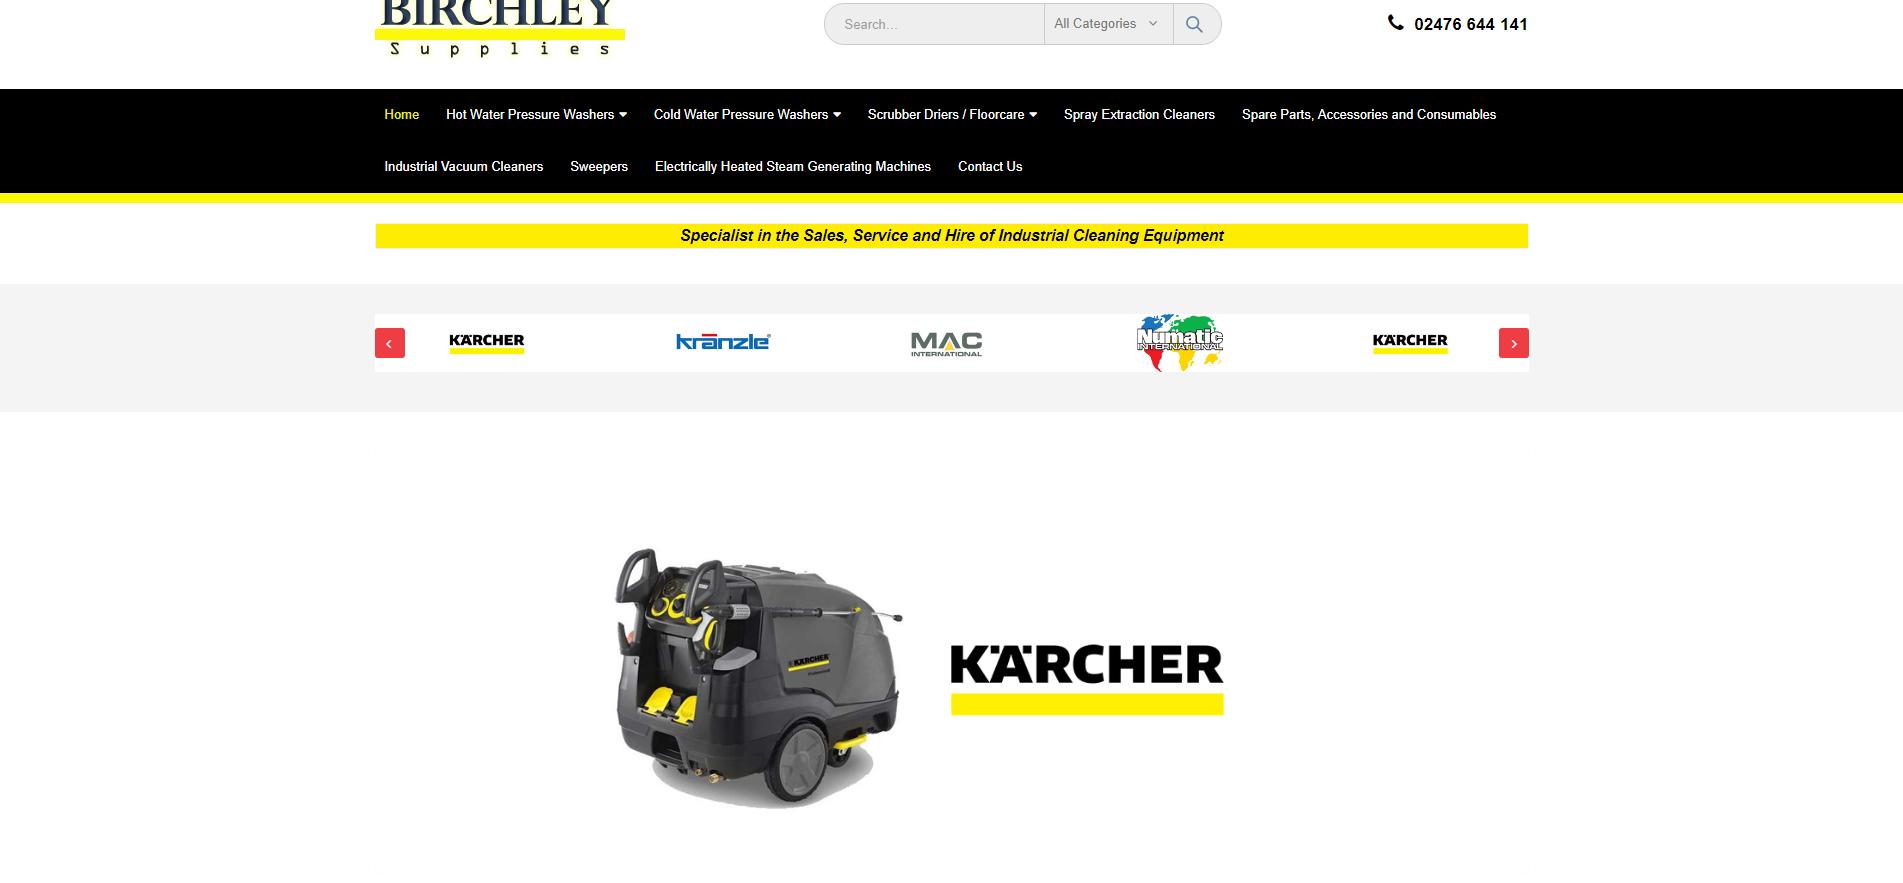 Birchley Supplies- Web Design Blackburn